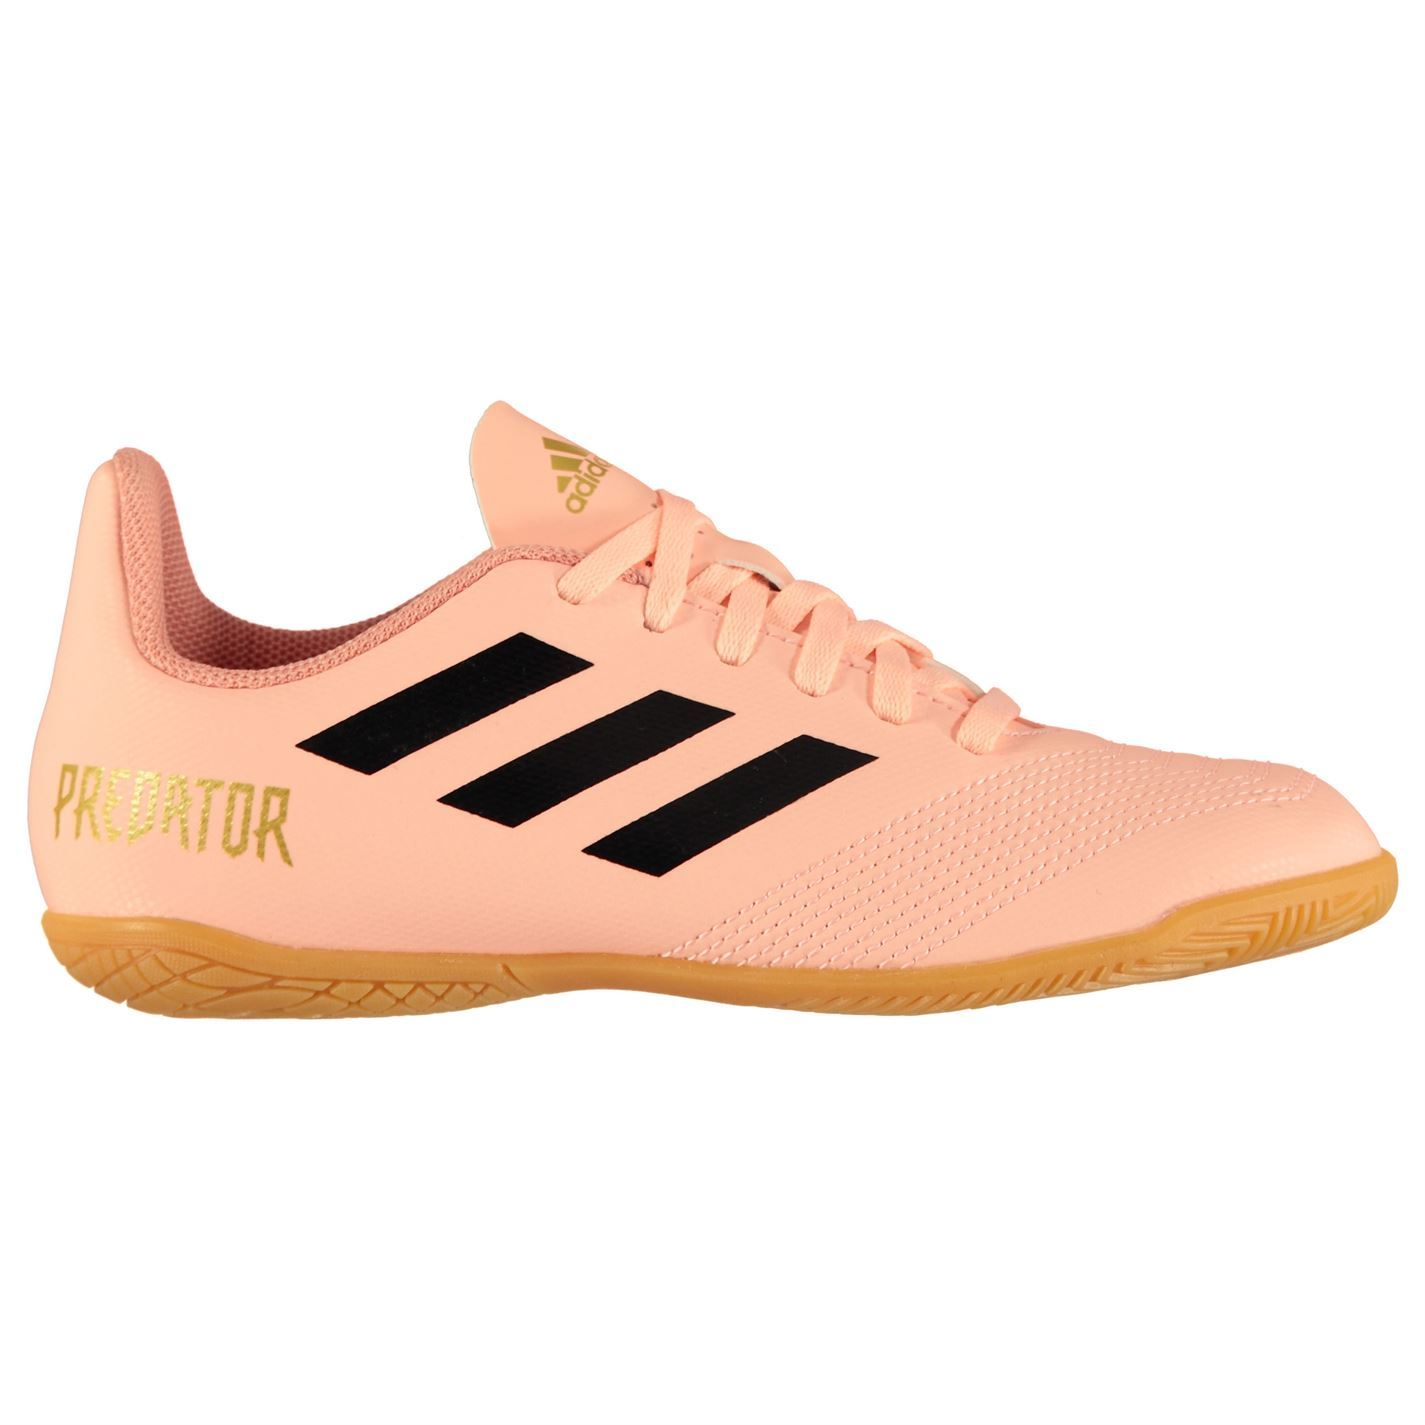 da5f4c950f2 ... adidas Predator Tango 18.4 Indoor Football Trainers Juniors Soccer Shoes